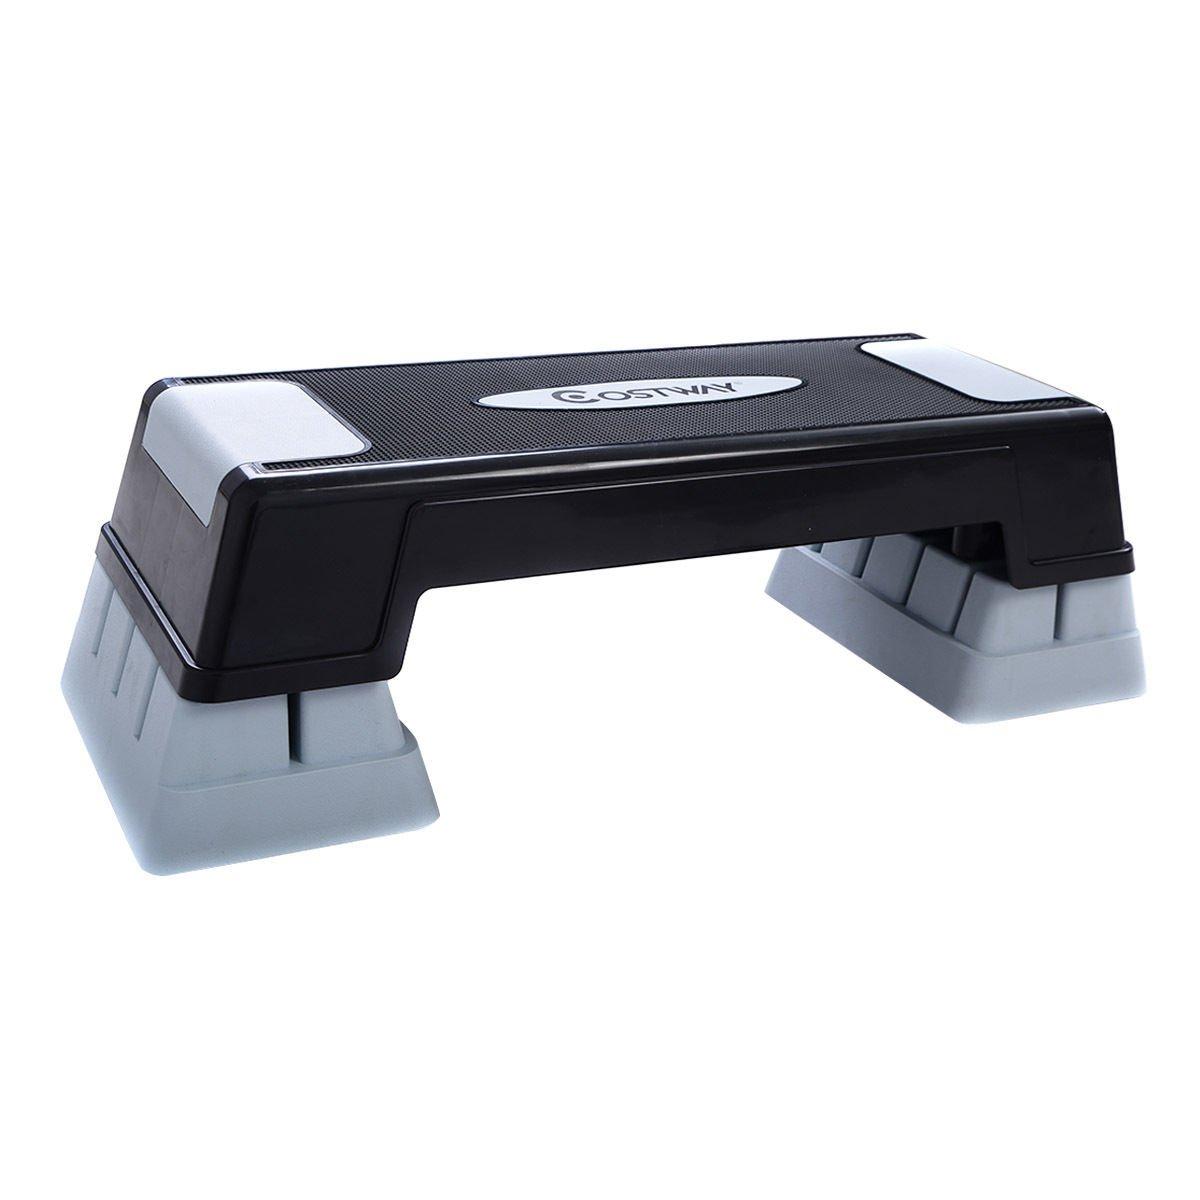 "Costway 29"" Aerobic Fitness Stepper Platform Adjust 5'' - 7'' - 9'' Exercise Stepper w/Risers"